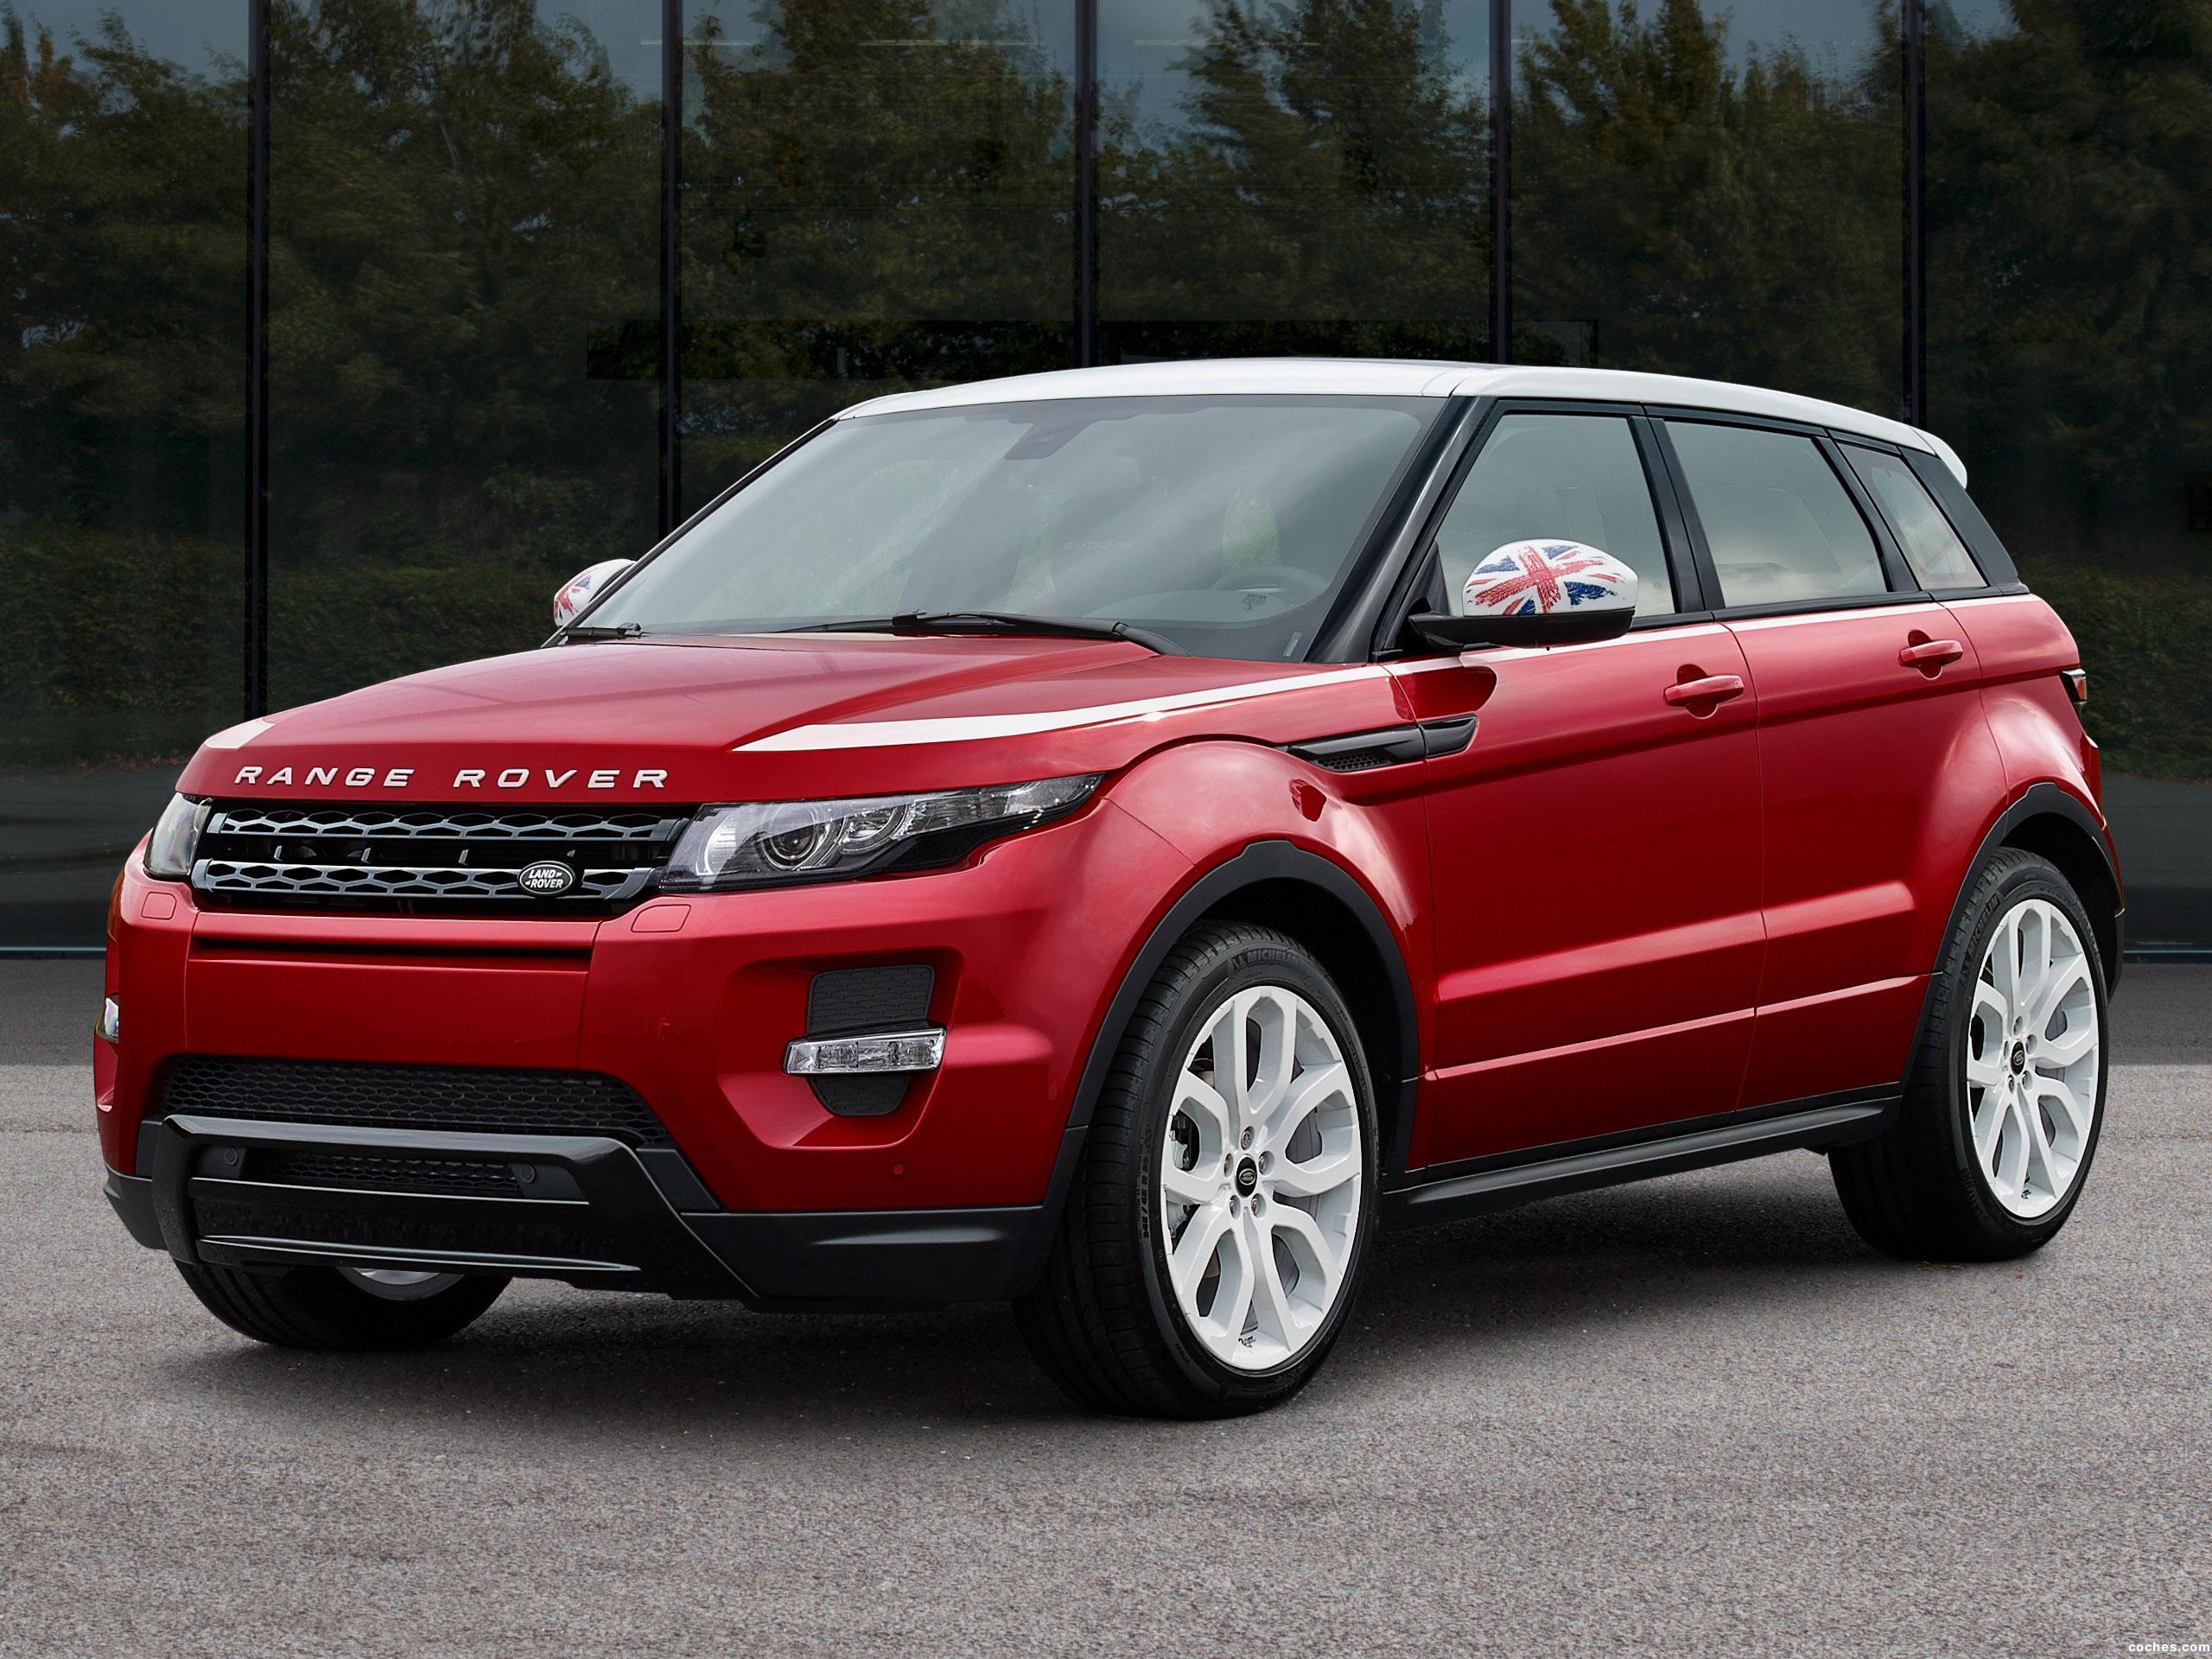 camion comprar range rover evoque precio 2014. Black Bedroom Furniture Sets. Home Design Ideas